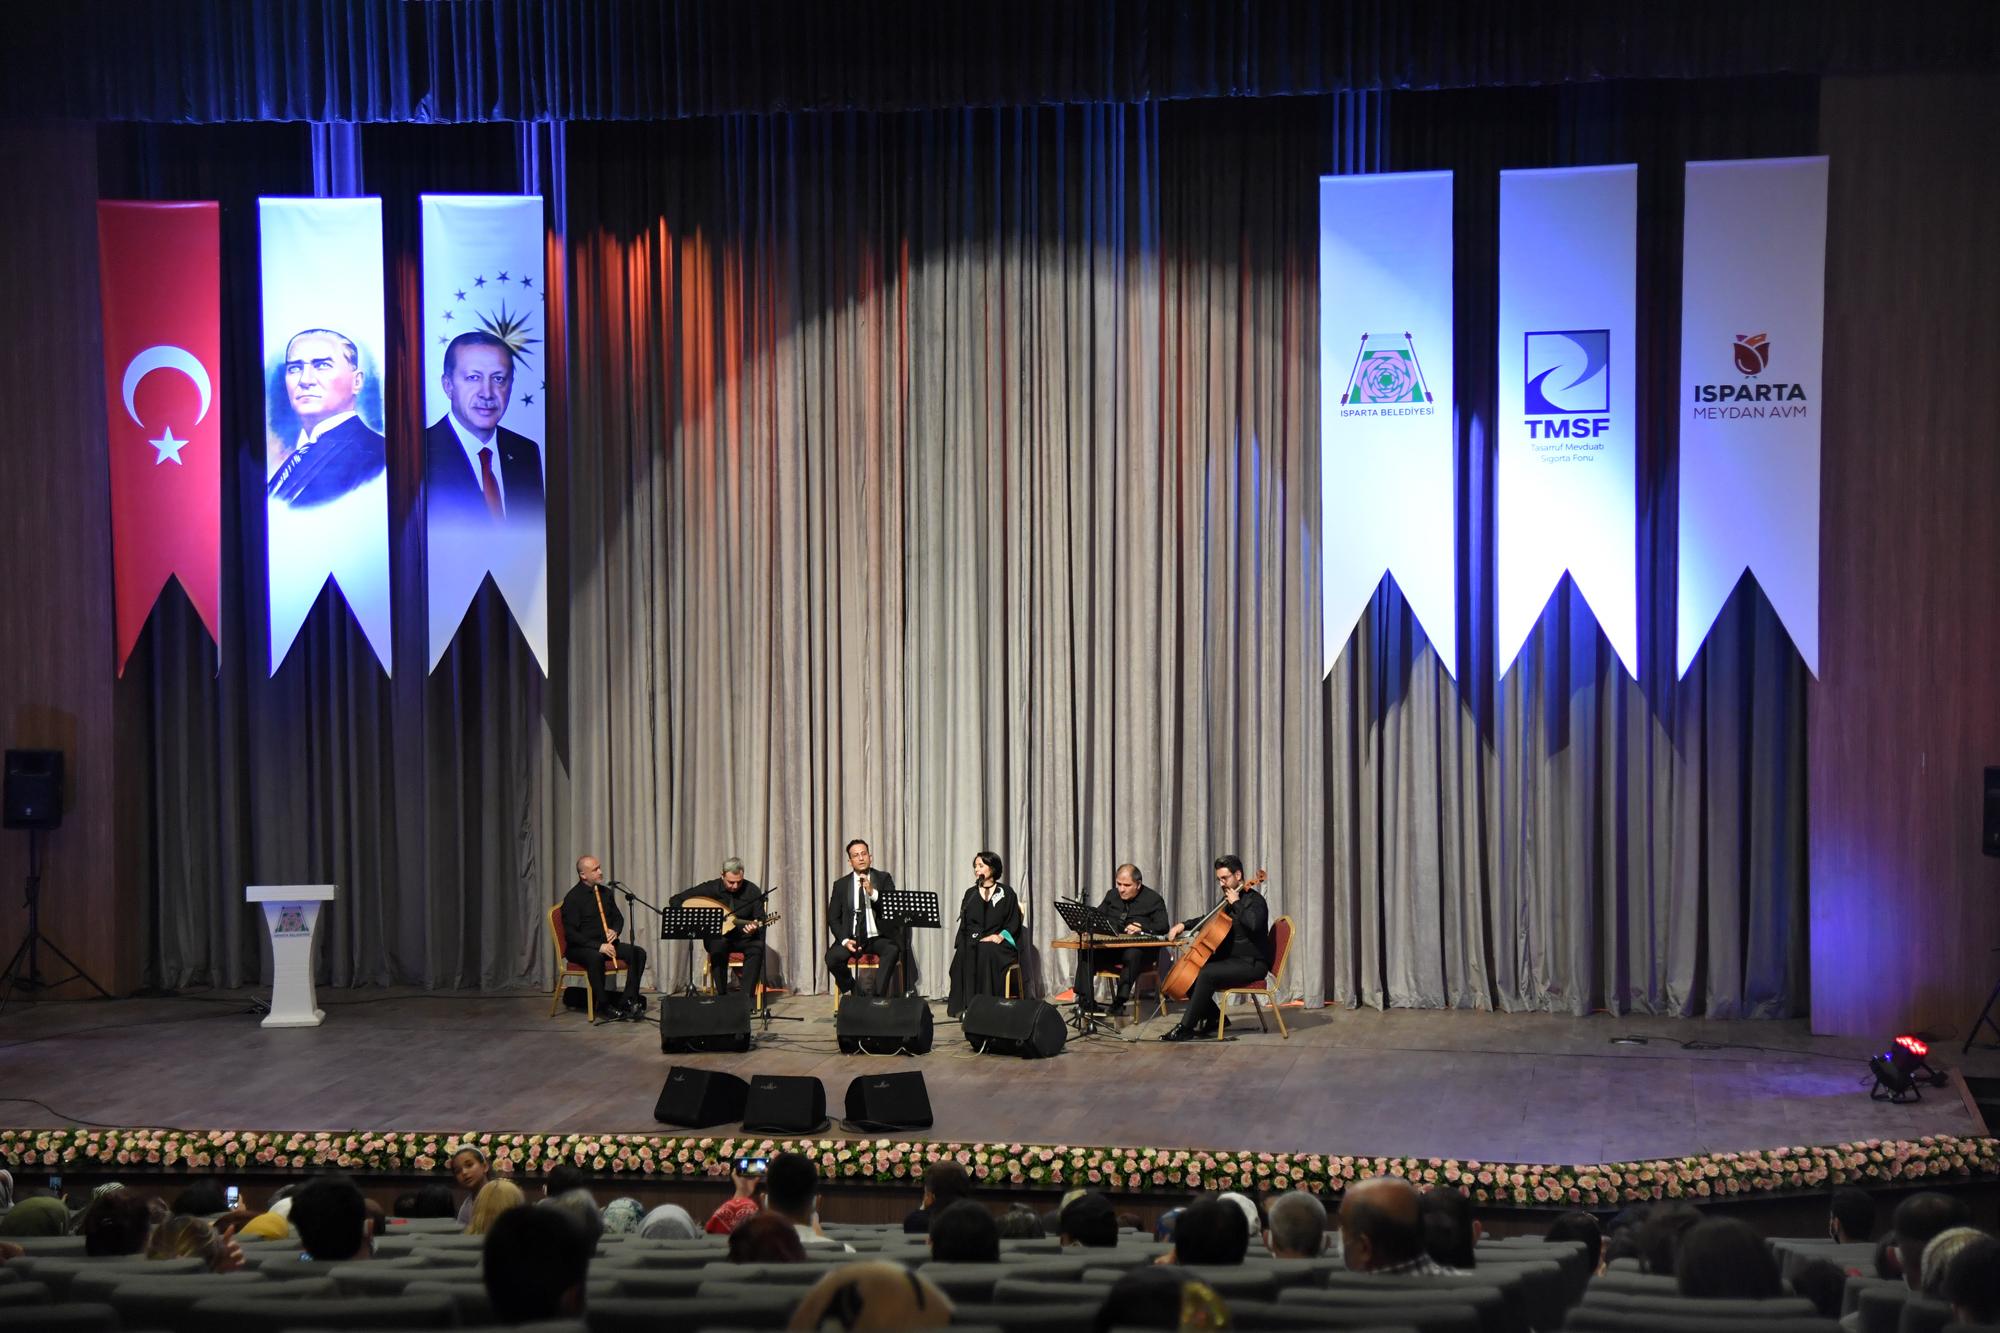 06-07-2021-tkm-kultur-merkezi-konser-2